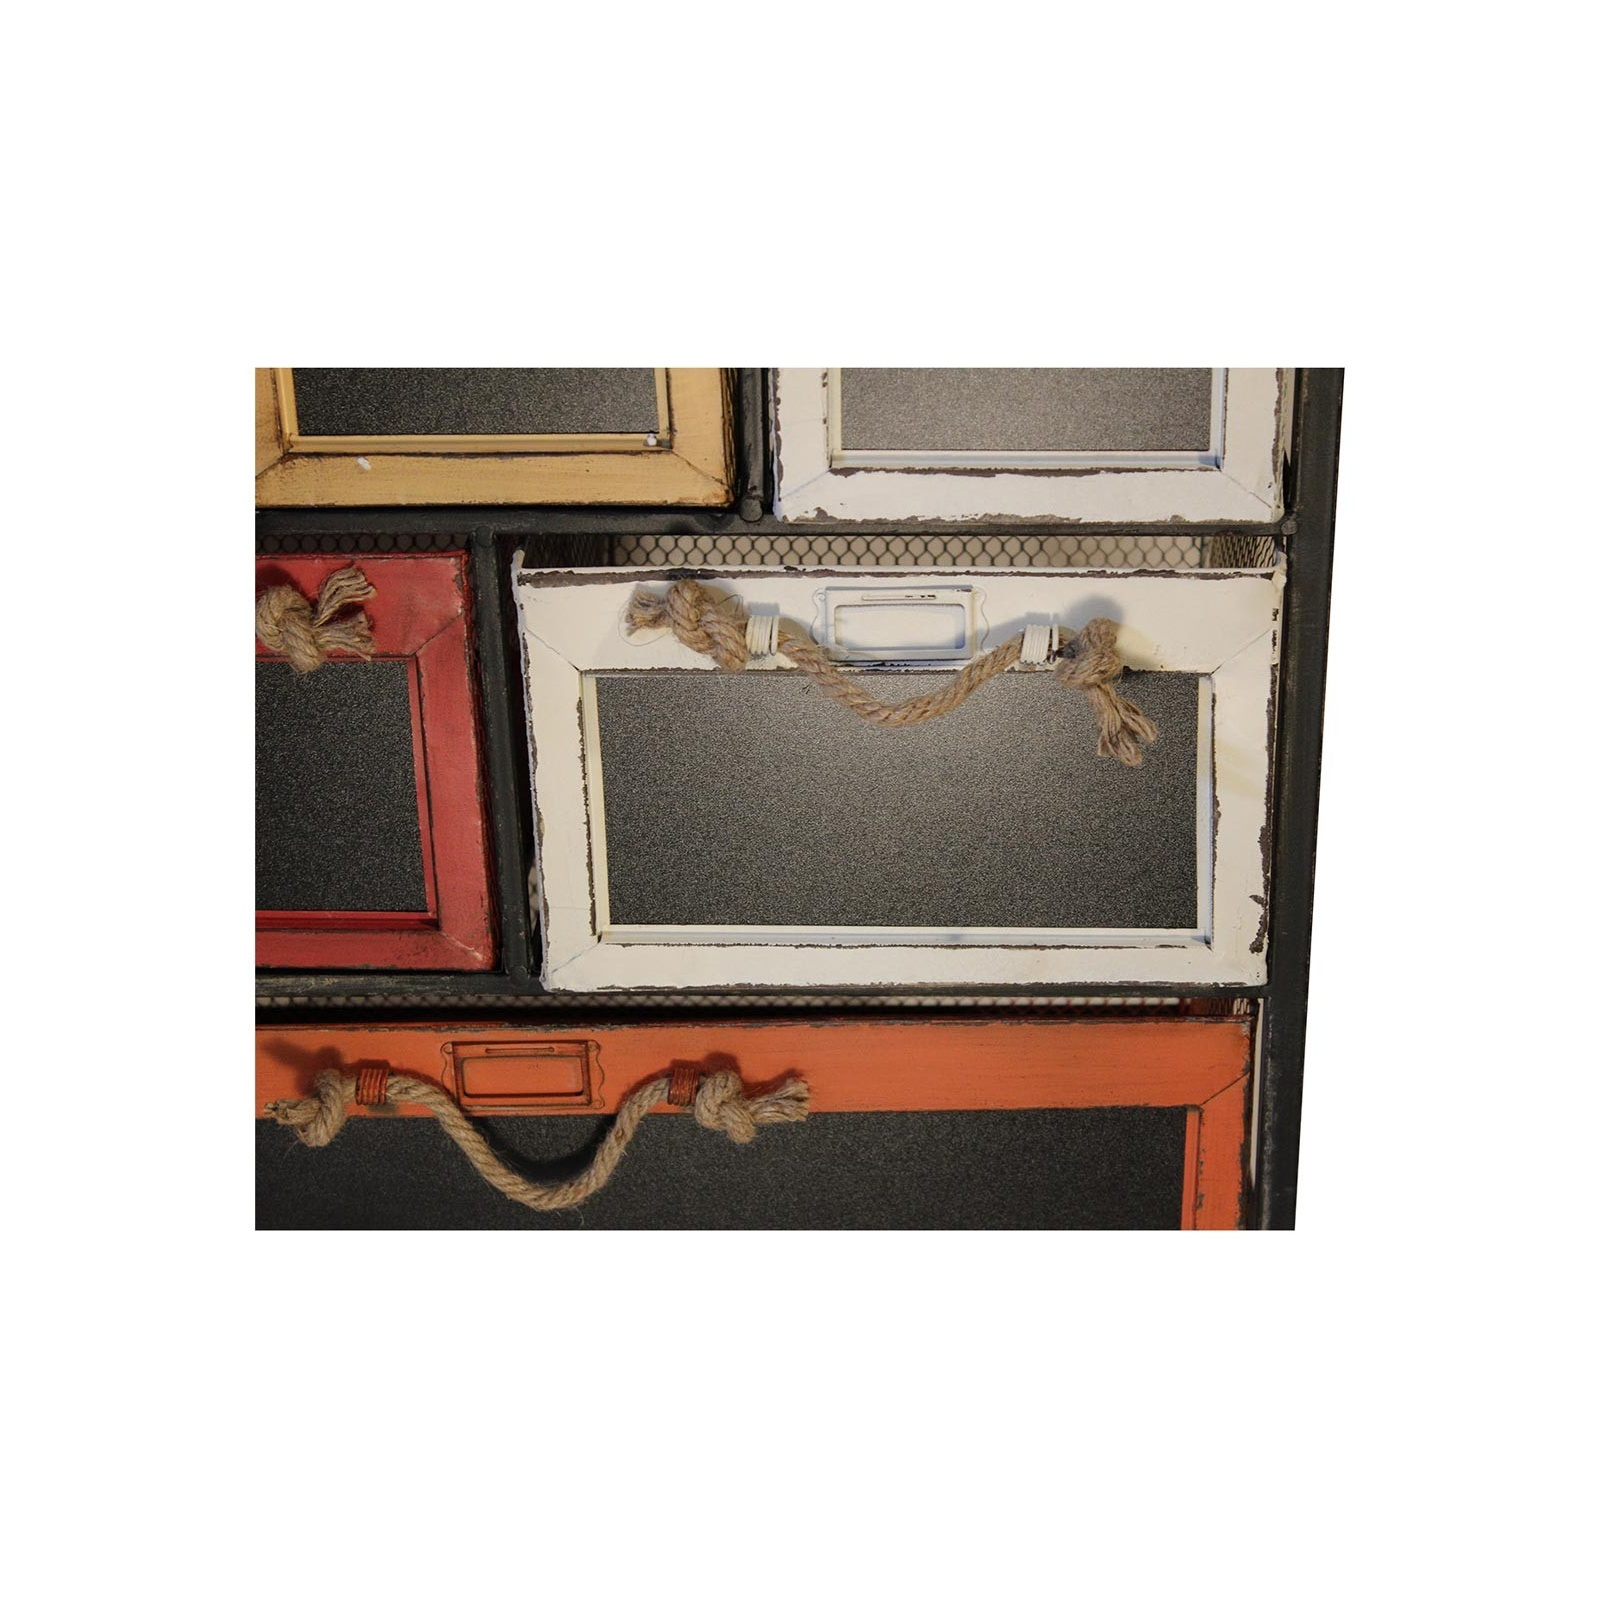 chiffonnier vintage jp2b d coration. Black Bedroom Furniture Sets. Home Design Ideas